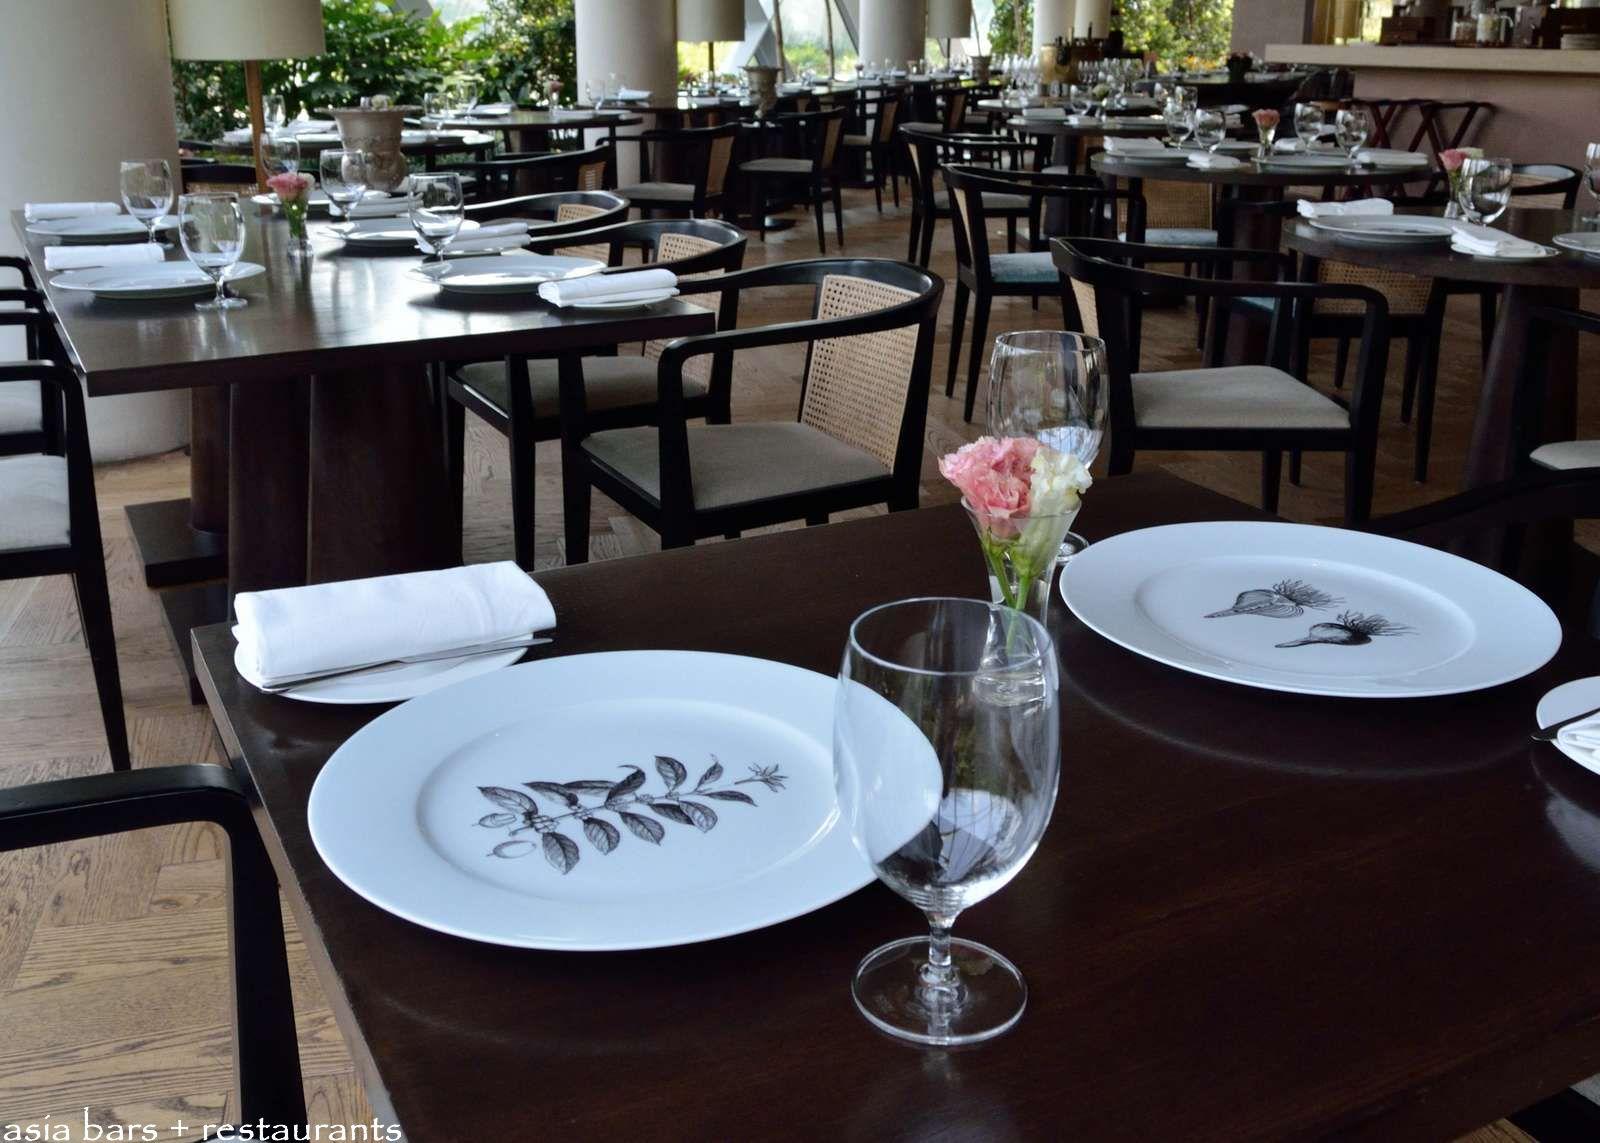 Restaurant table setting ideas - Fine Dining Restaurant Table Setup Dining Table Ideas